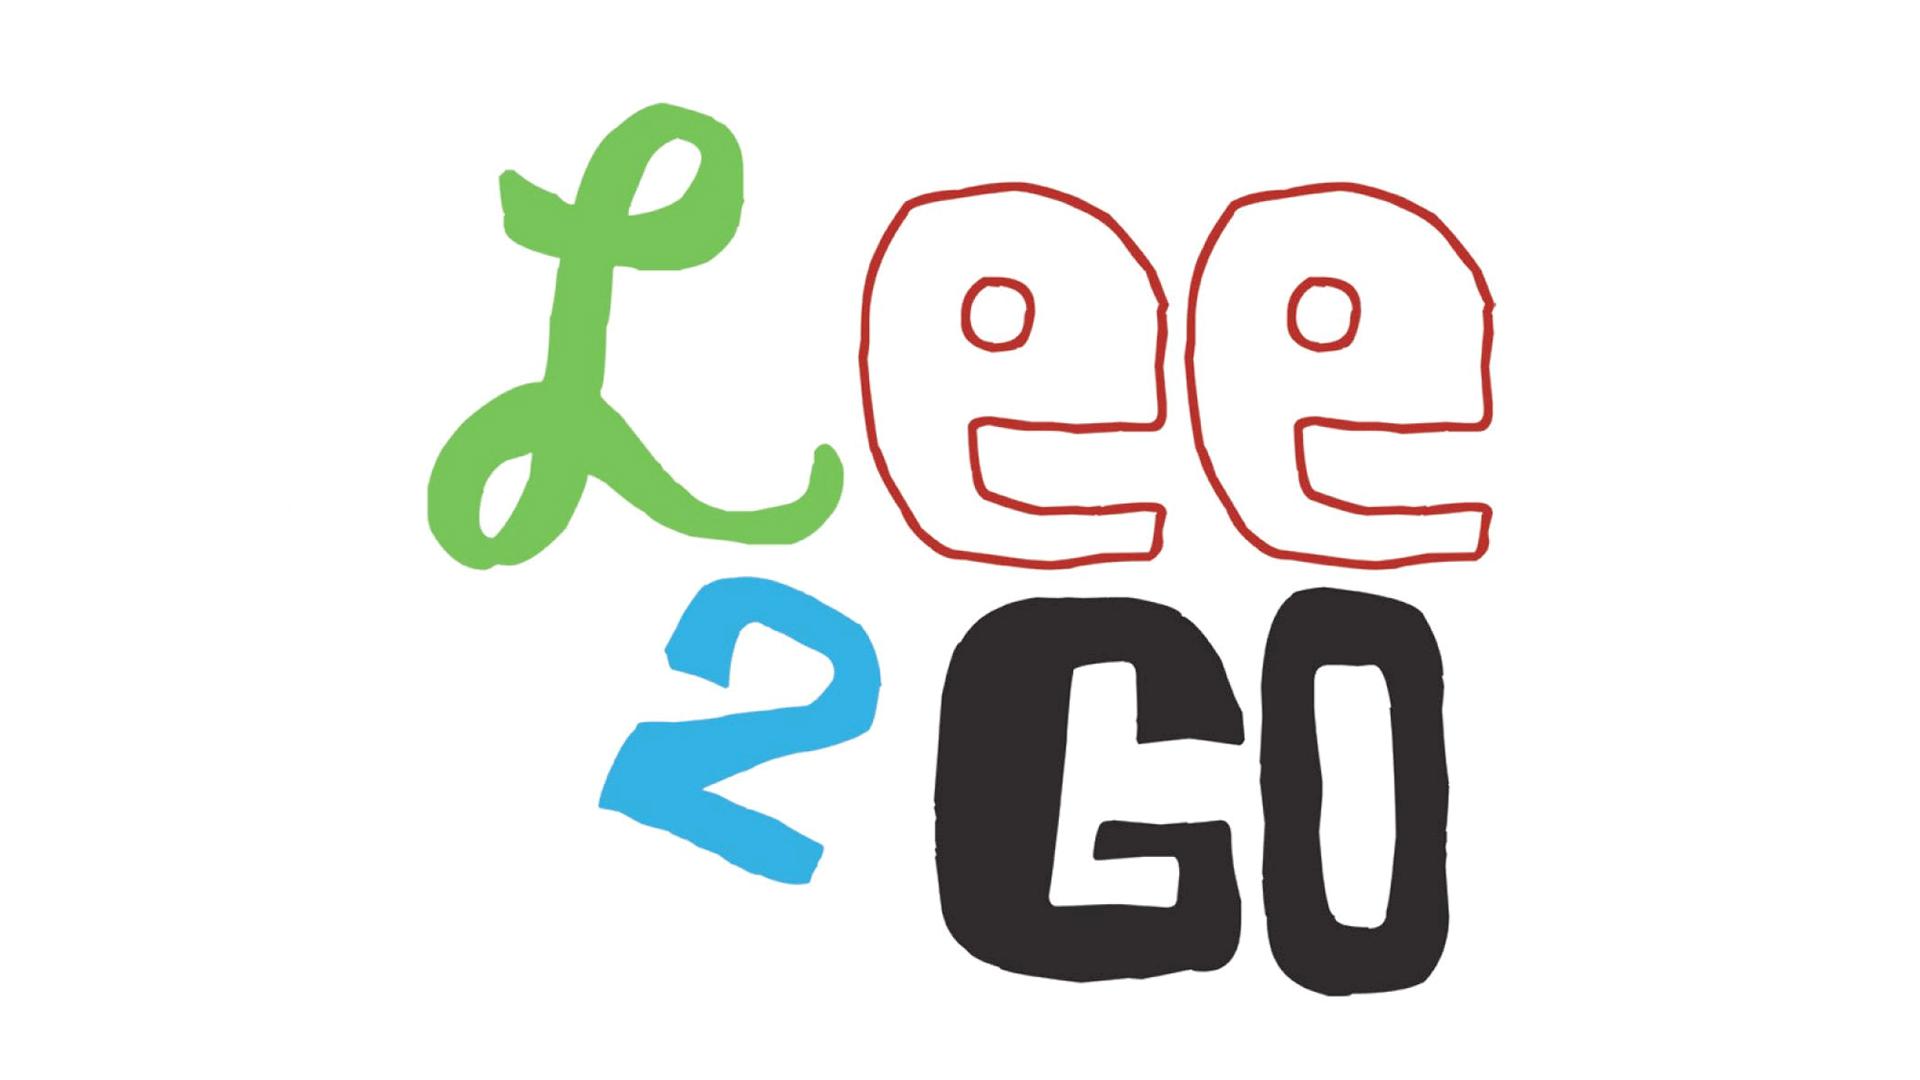 logo-screen-fb-sized